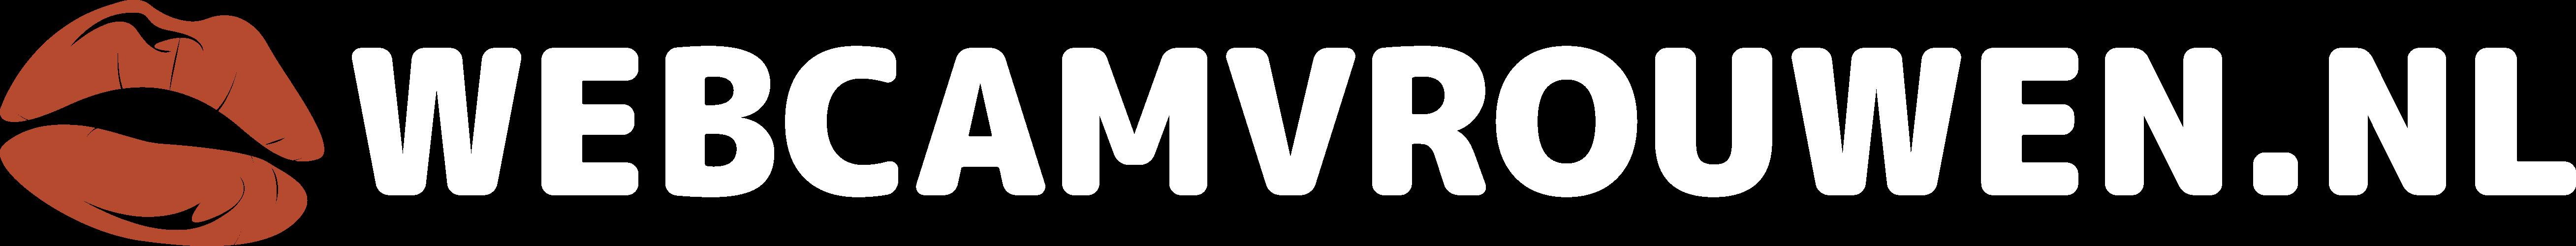 Webcamvrouwen.nl